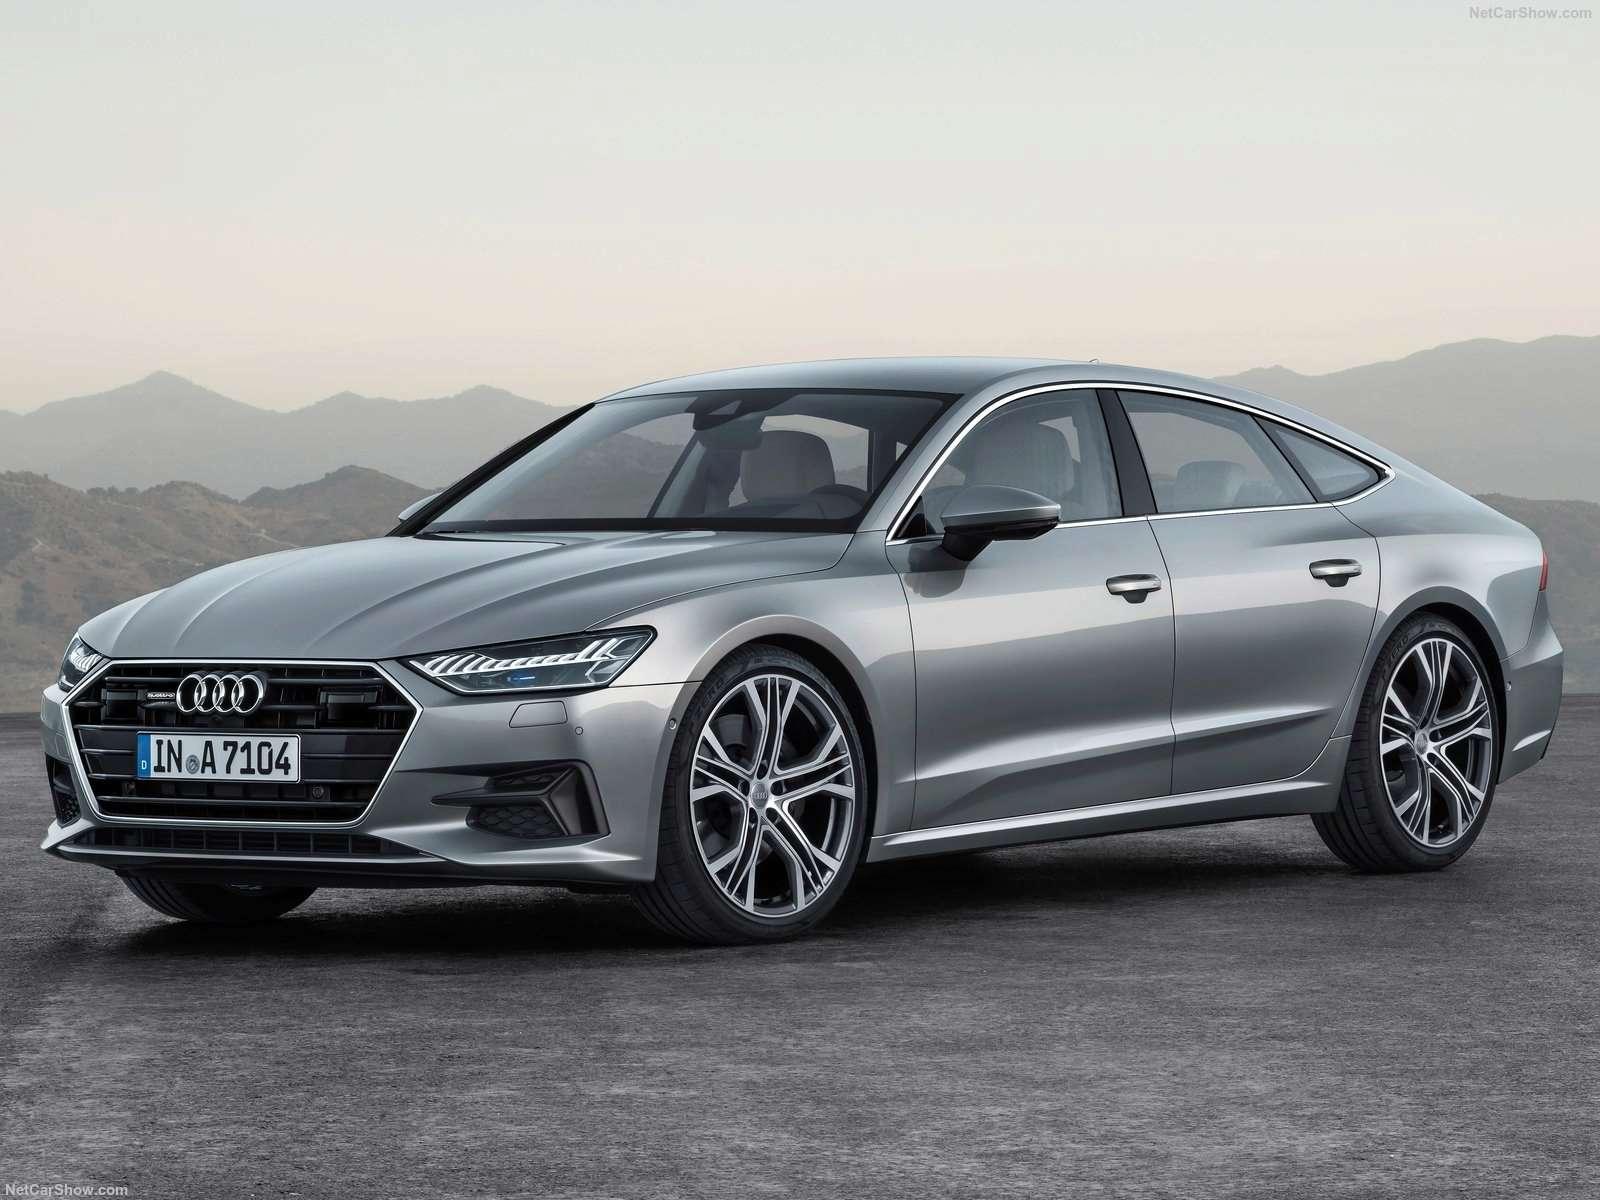 2017 - [Audi] A7 Sportback II - Page 6 Audi-a19